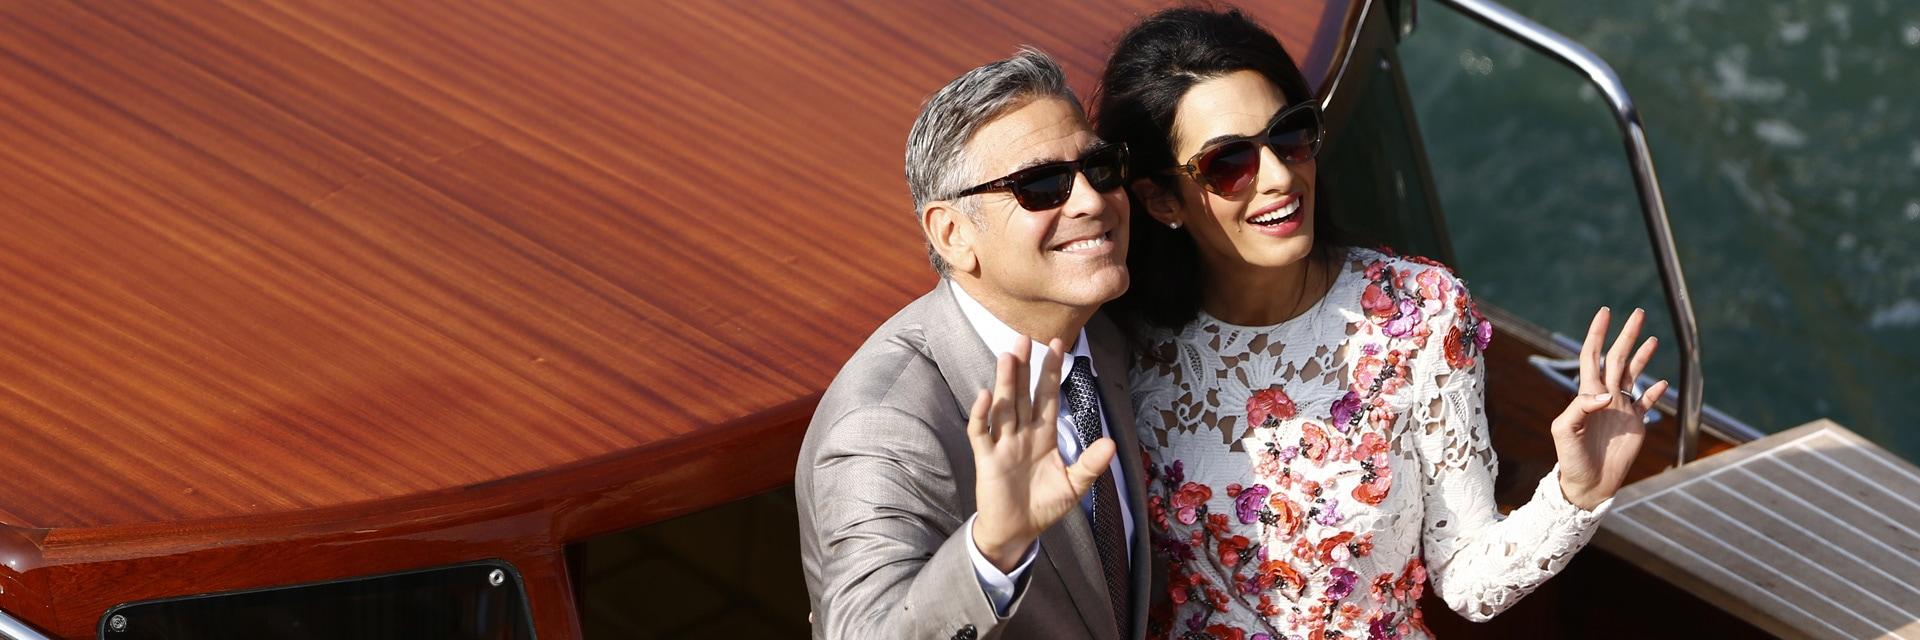 Amal Alamuddin si è sposata in Oscar de La Renta